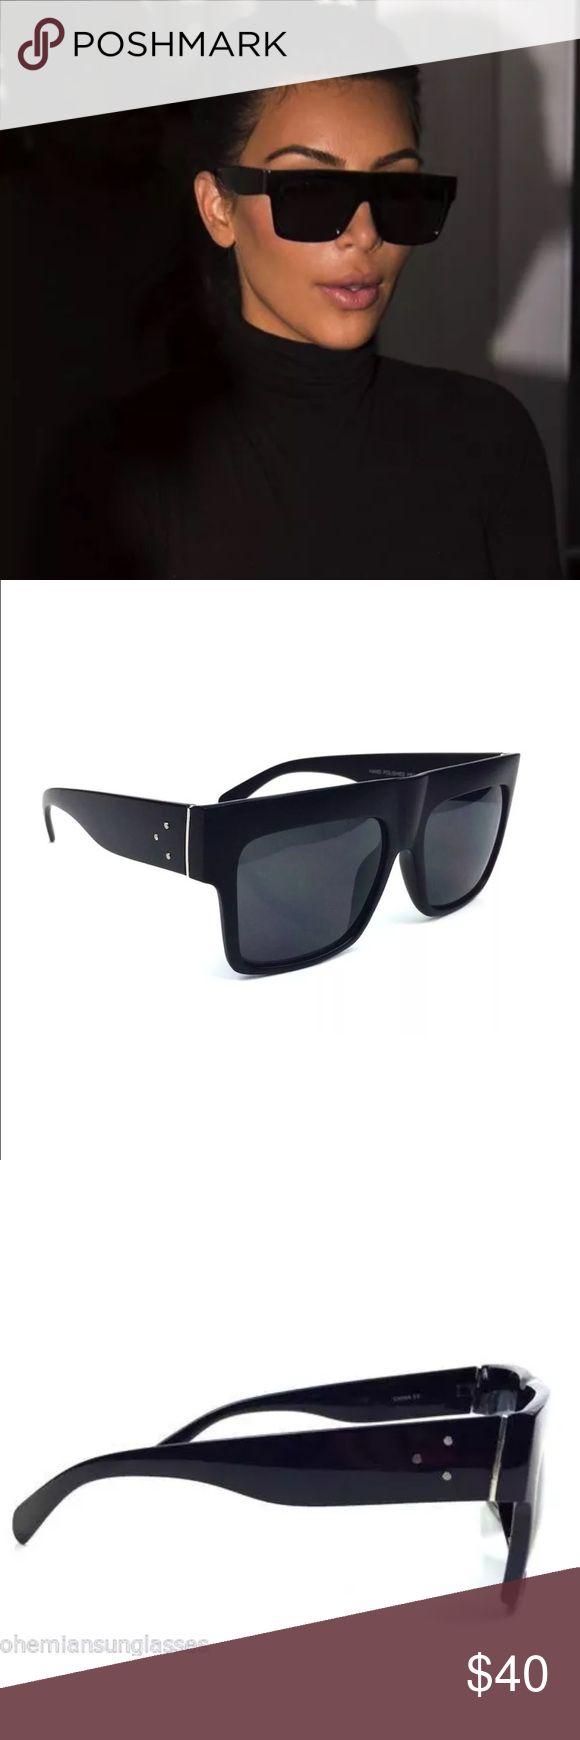 9040d4ad2b3 Big Aviator Sunglasses Kim Kardashian